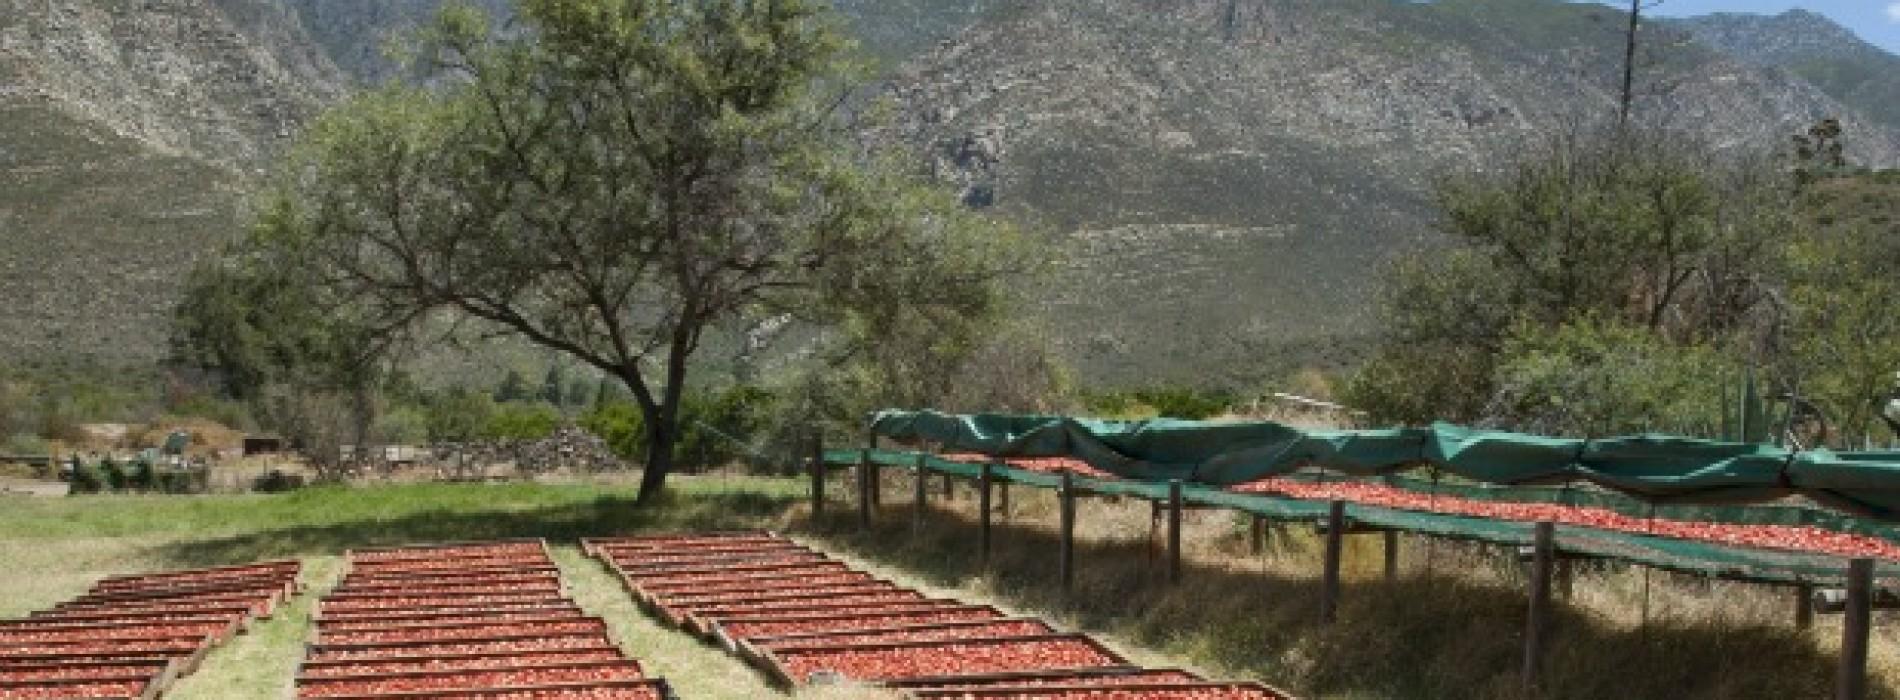 Le ricche famiglie americane guardano all'Agribusiness in Africa